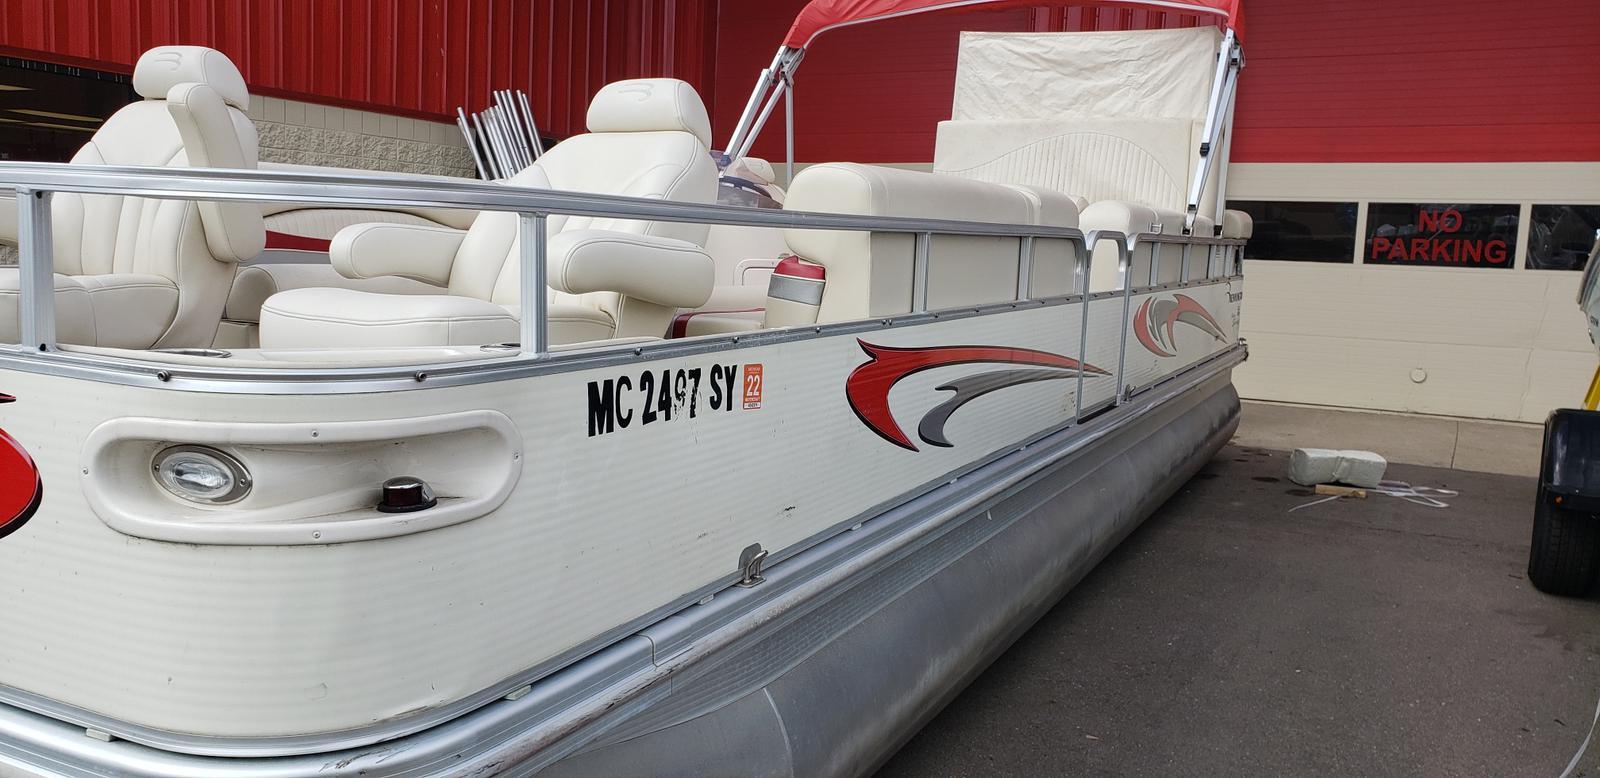 2007 Bennington boat for sale, model of the boat is 2577RFS & Image # 4 of 12